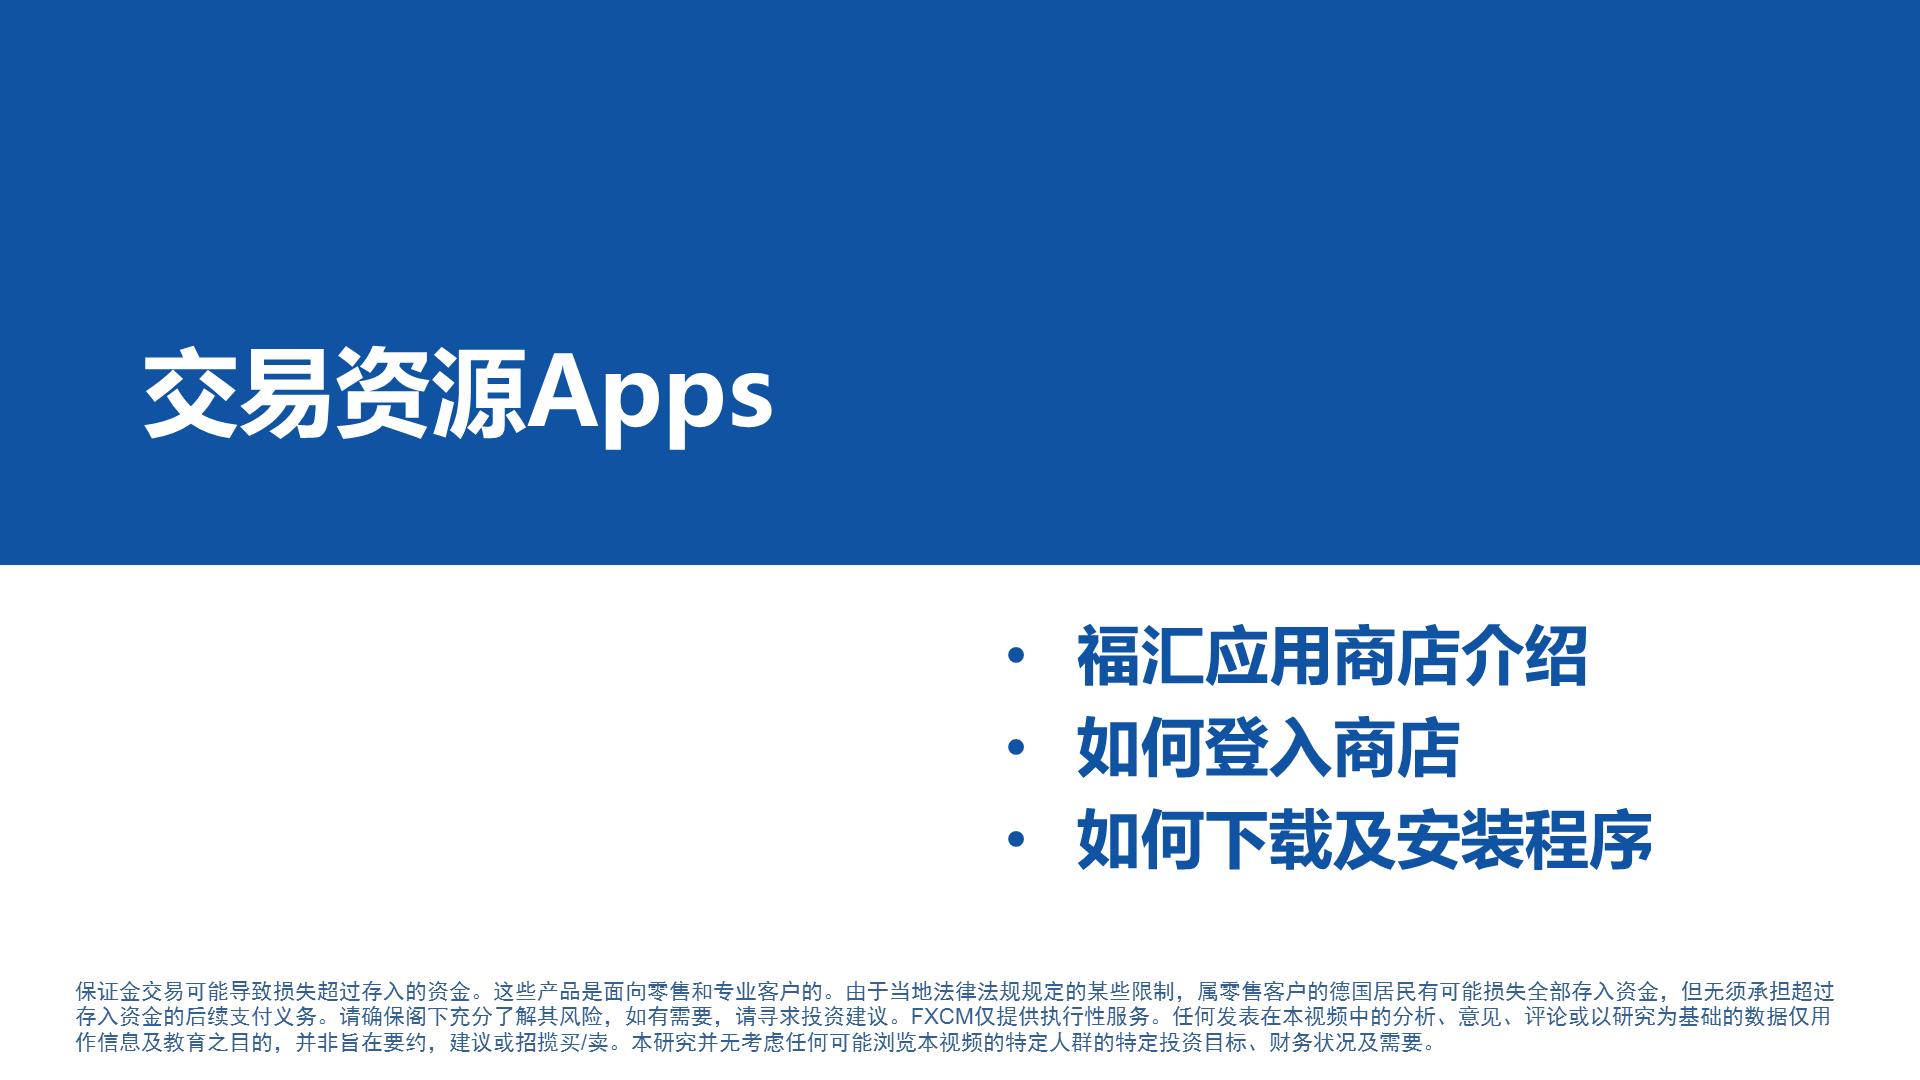 交易资源Apps